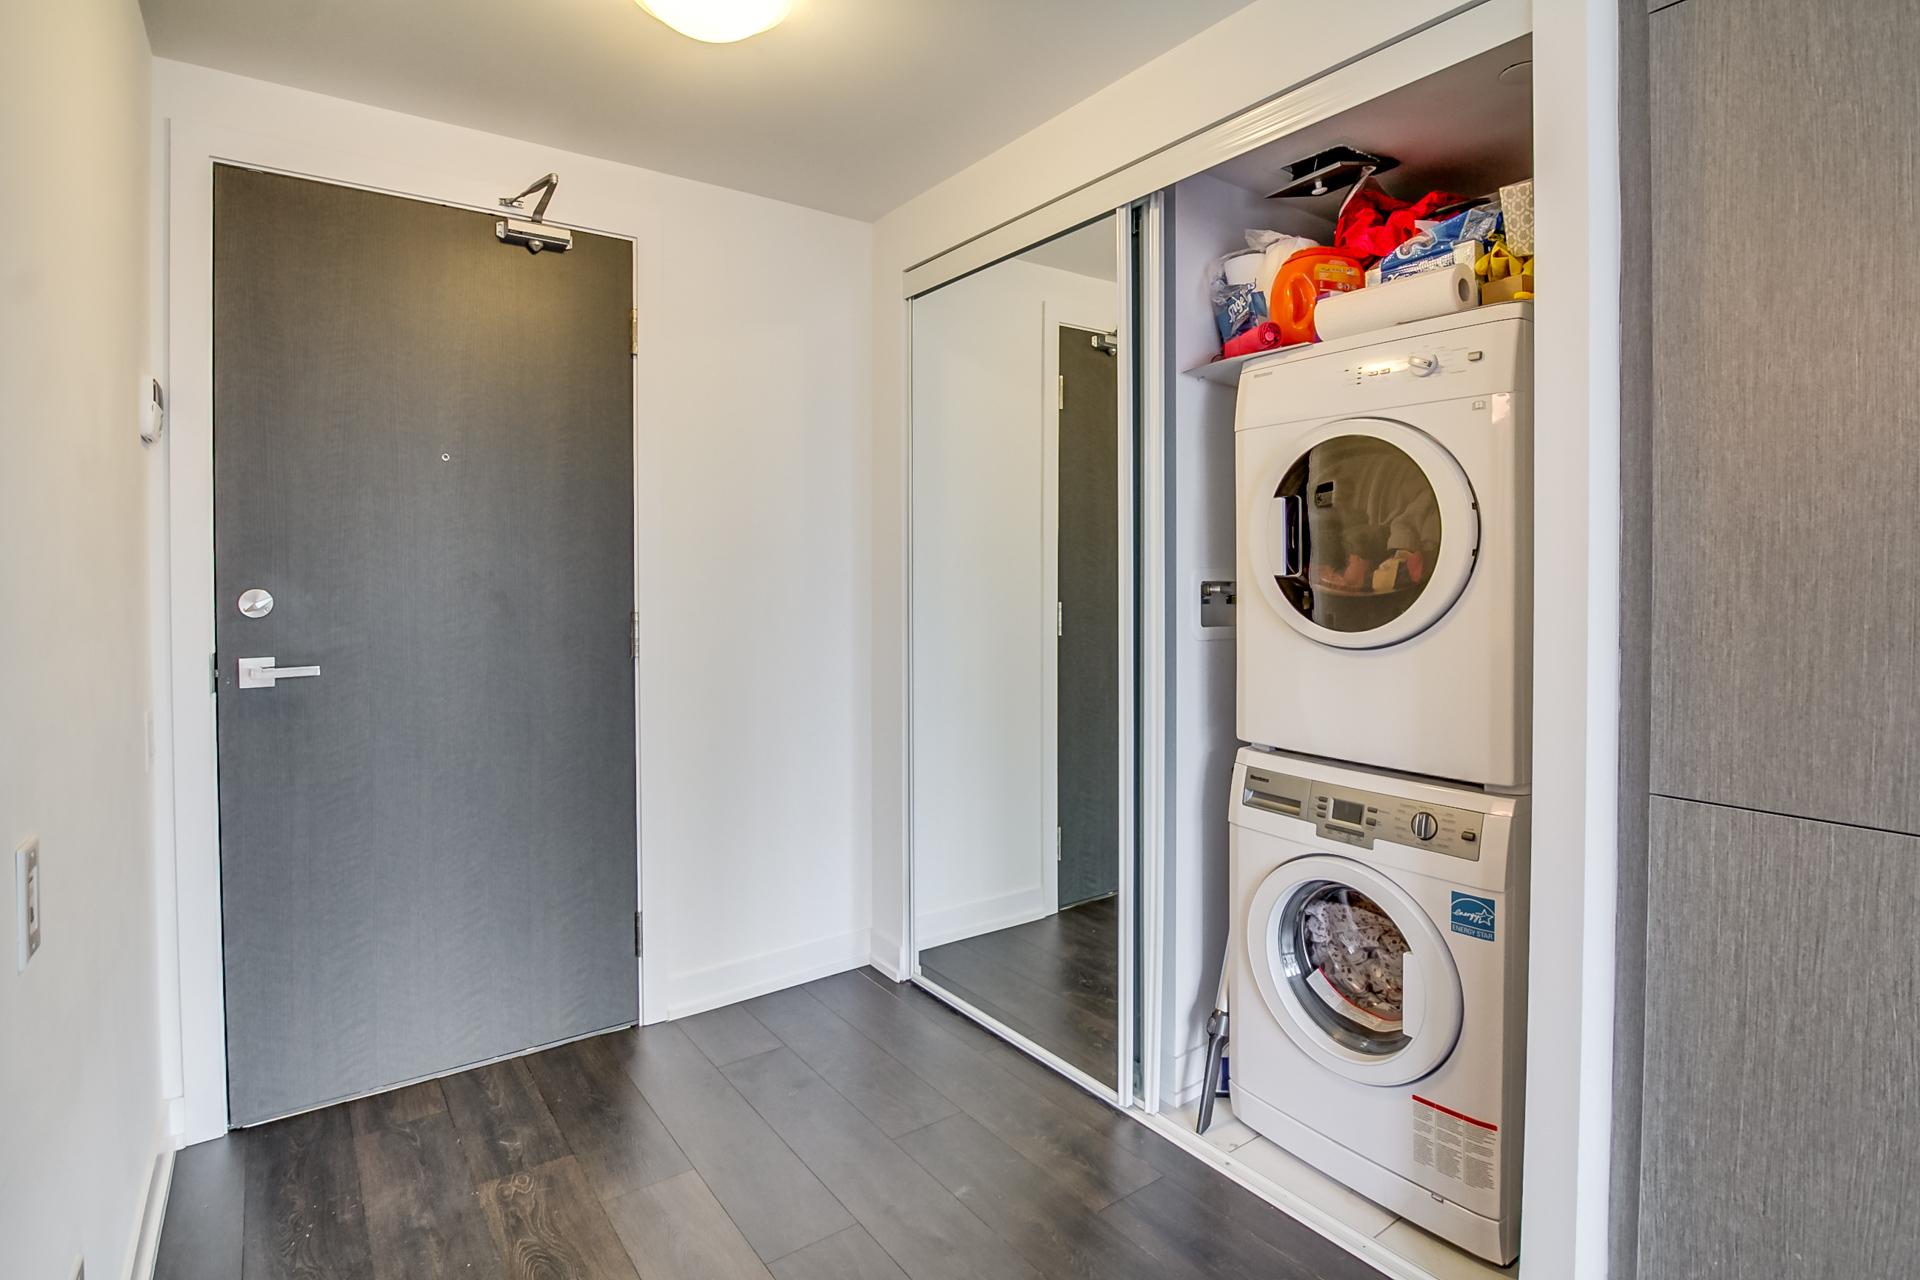 21_laundry_room1.jpg